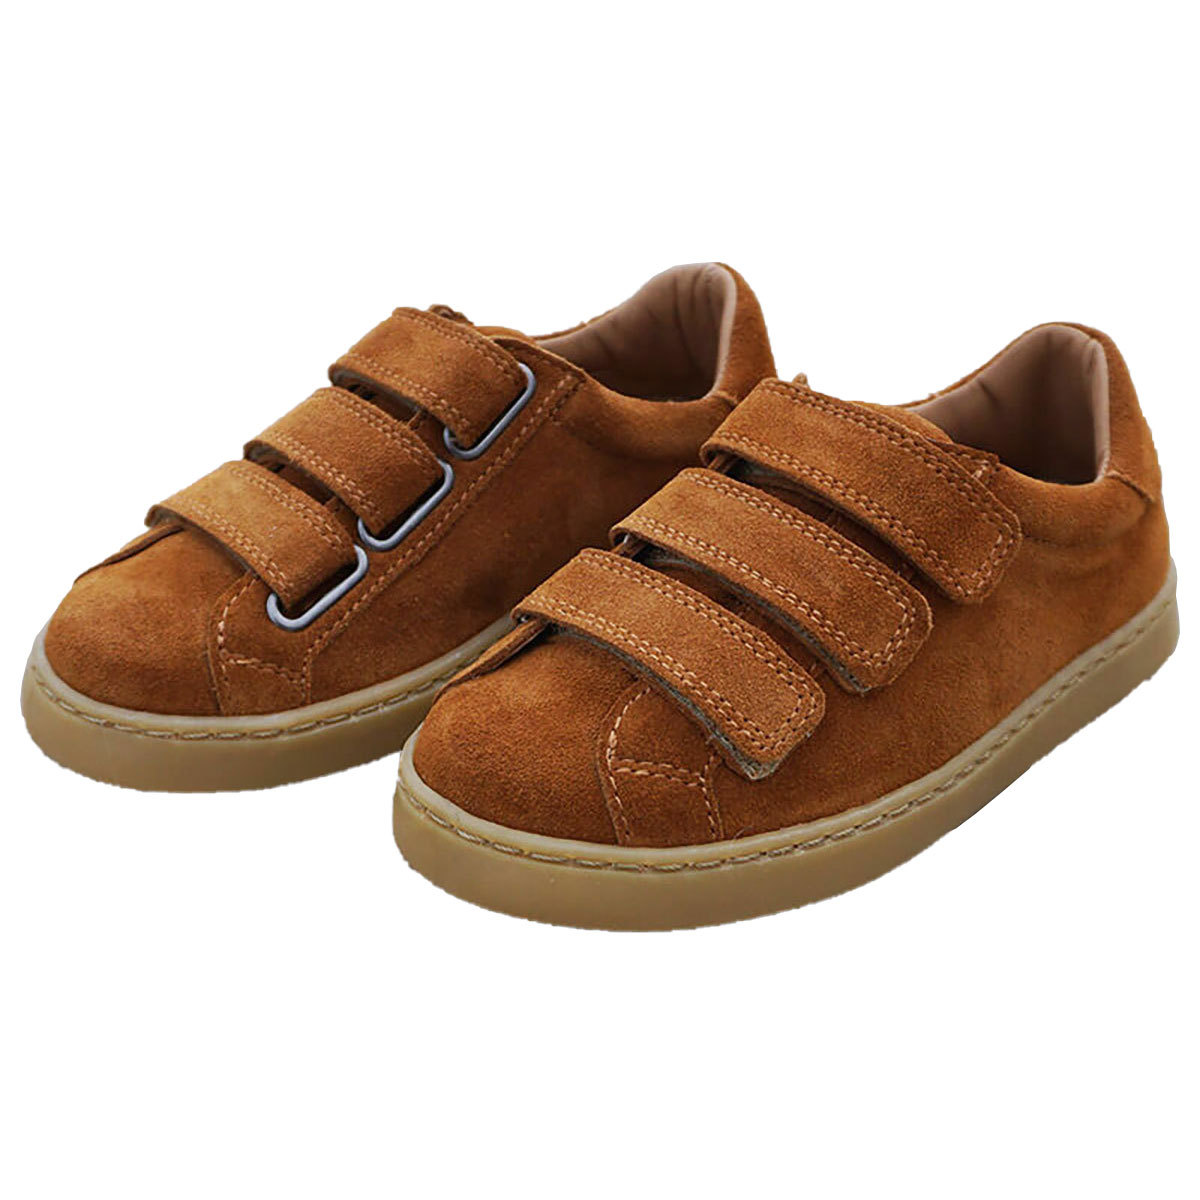 Chaussons & Chaussures Basket Môme Camel - 24 Hippie Ya - AR201808130074